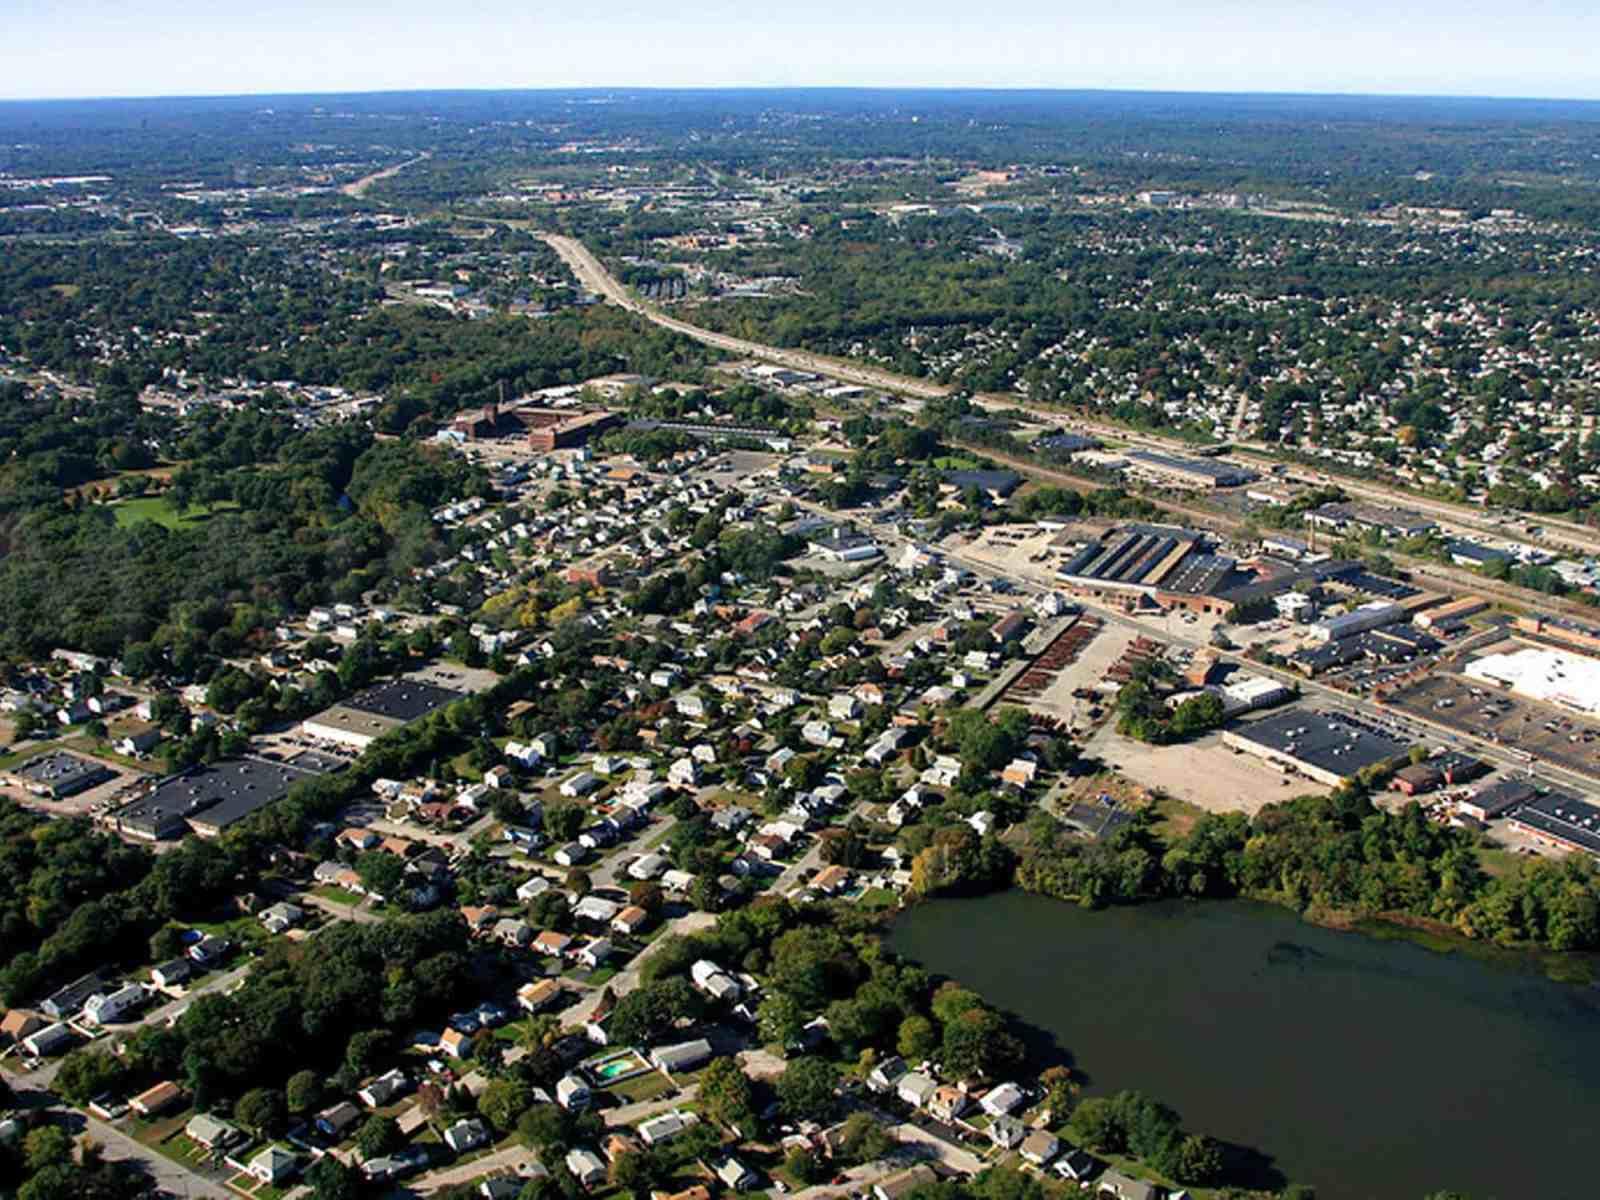 10 Reasons I Wish I Grew Up Literally Anywhere BUT Cranston, RI